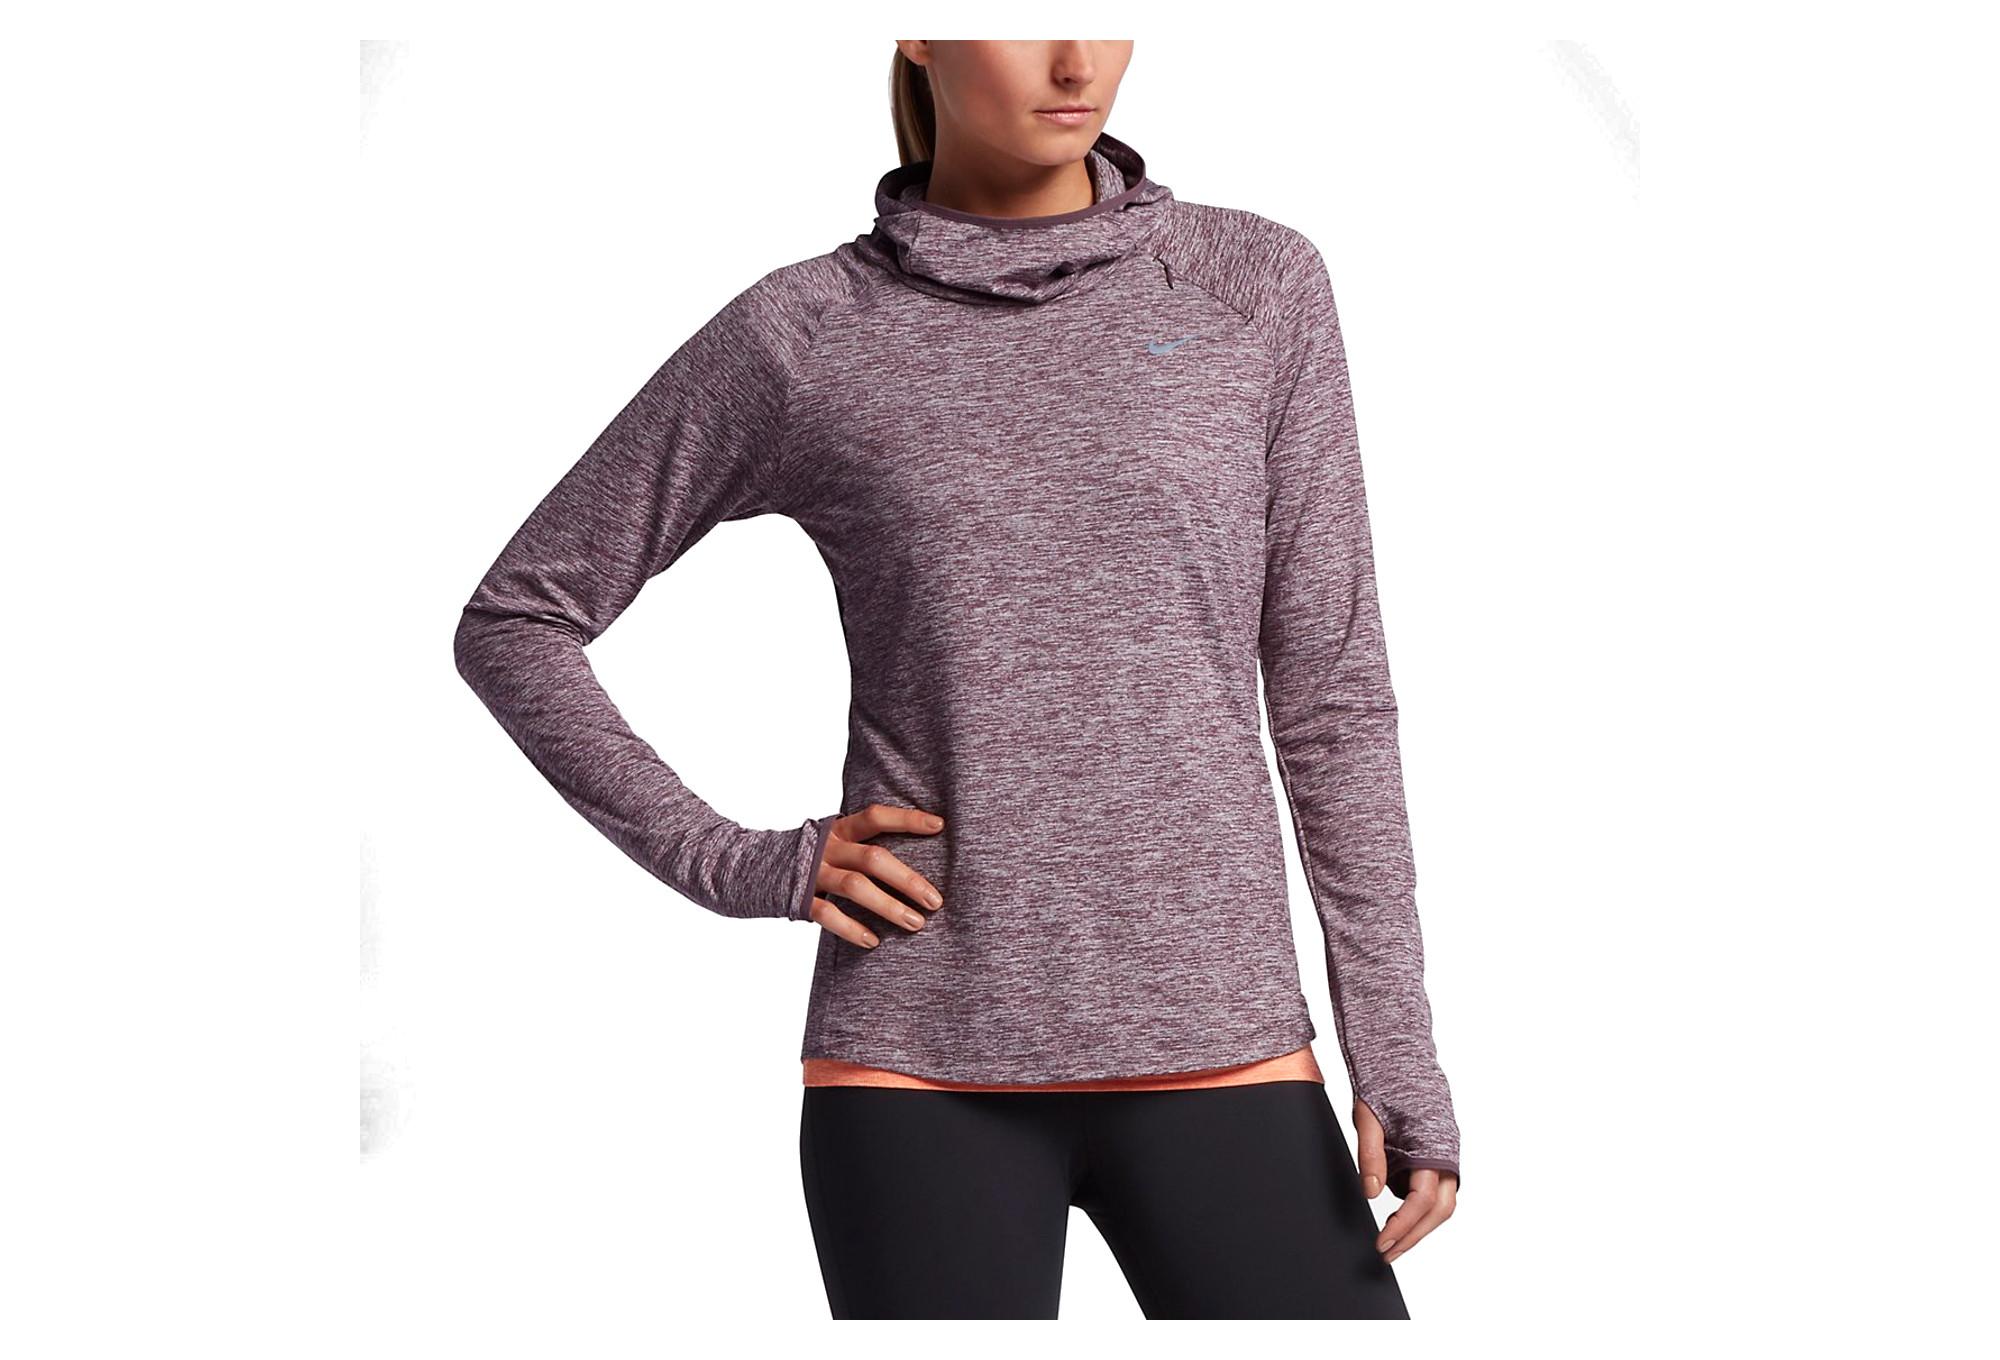 Element womens hoodies